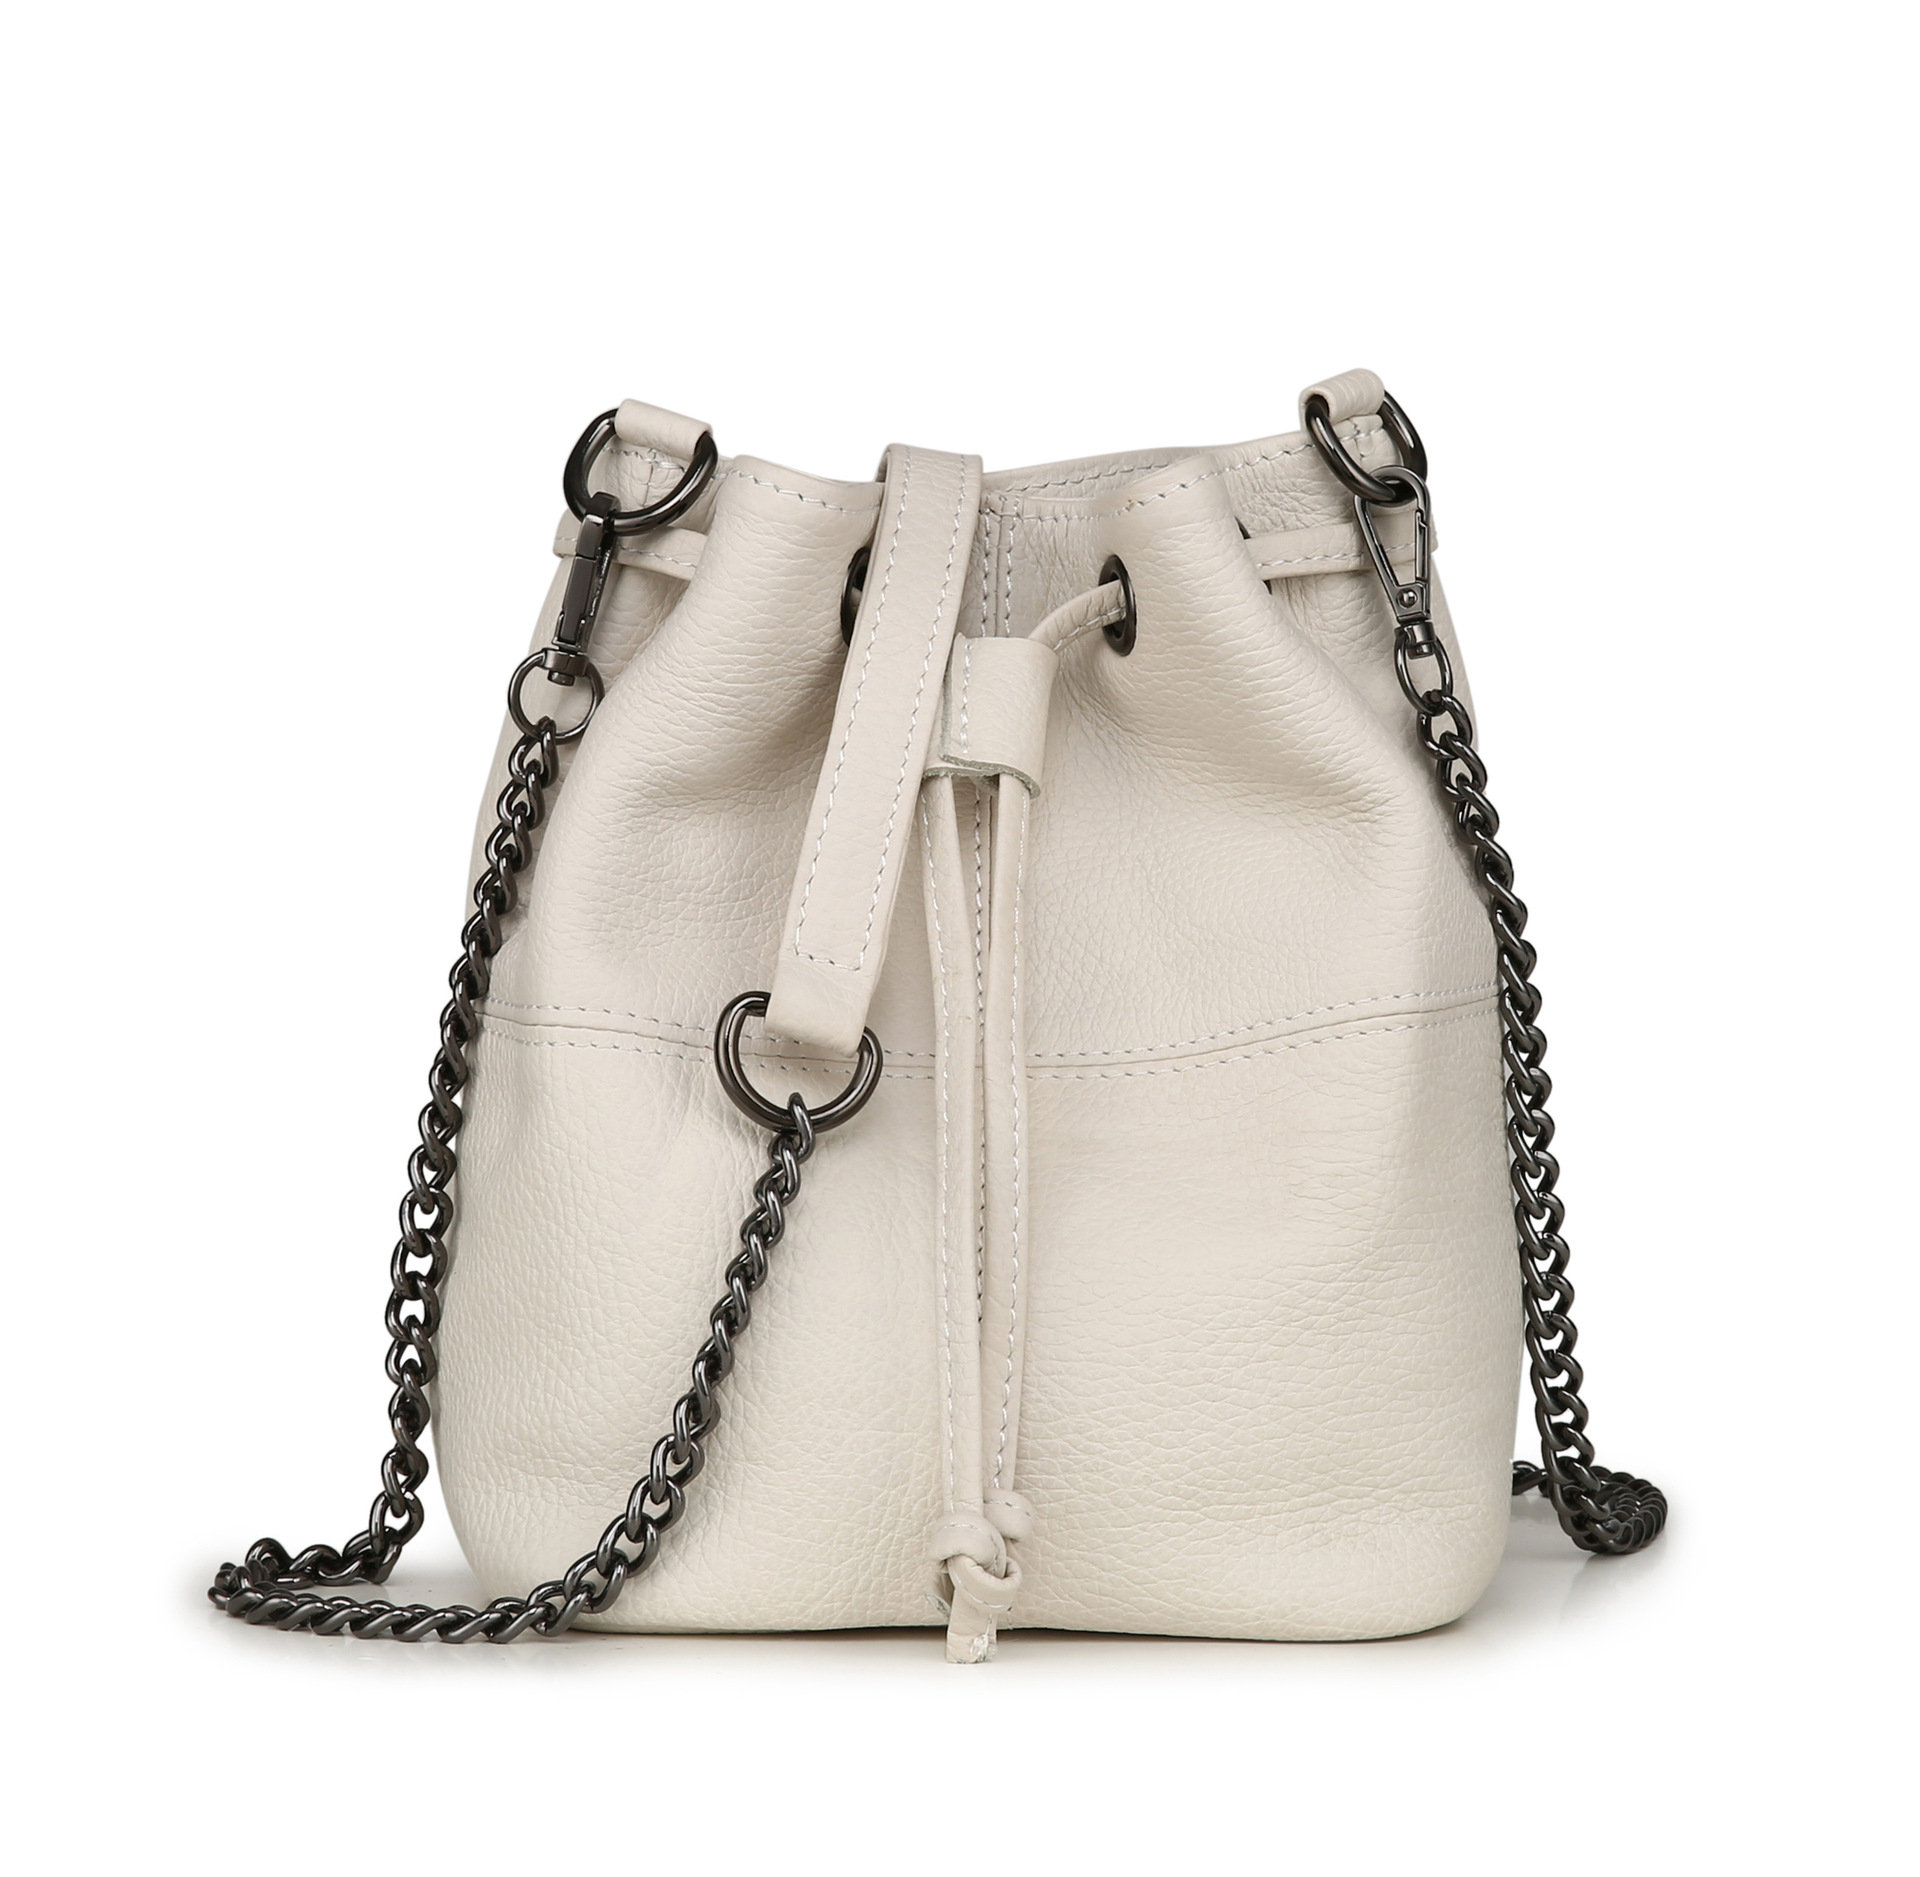 цена на 2018 New Arrival Female Bucket Bags Genuine Leather Handbags Famous Brand Design Women Messenger Bags Fashion Women Bags